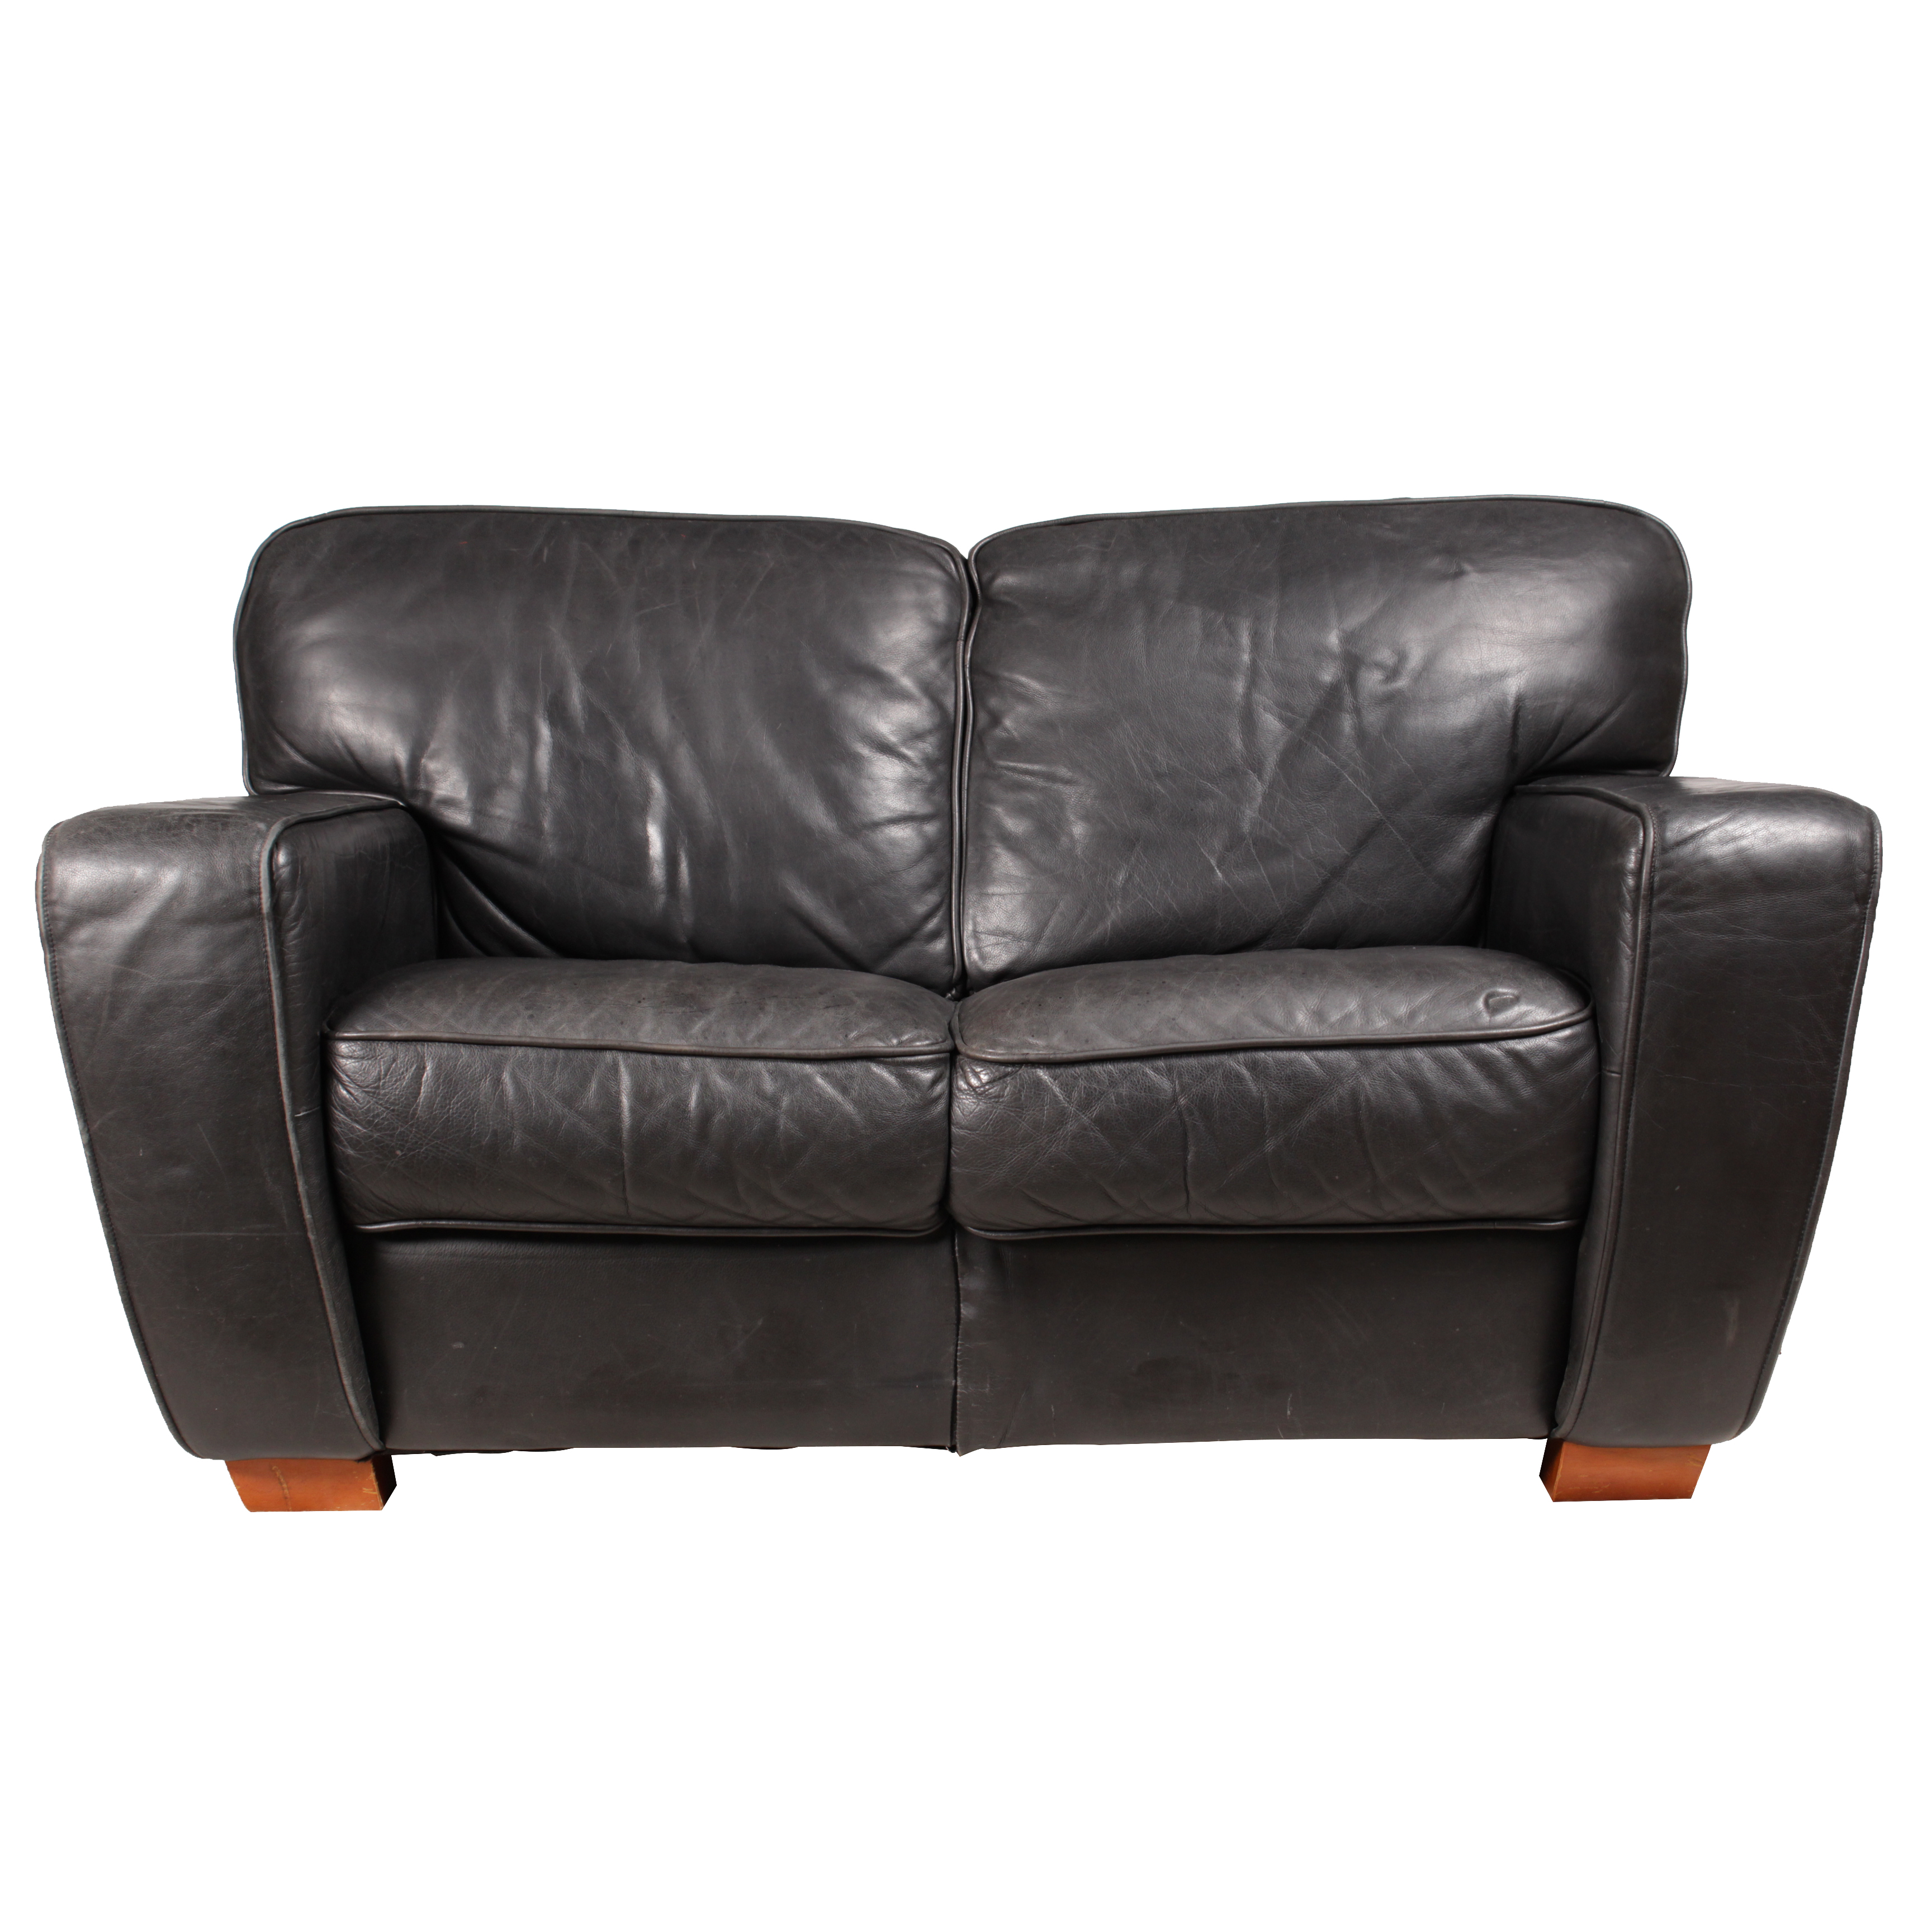 italian leather sofa by interline